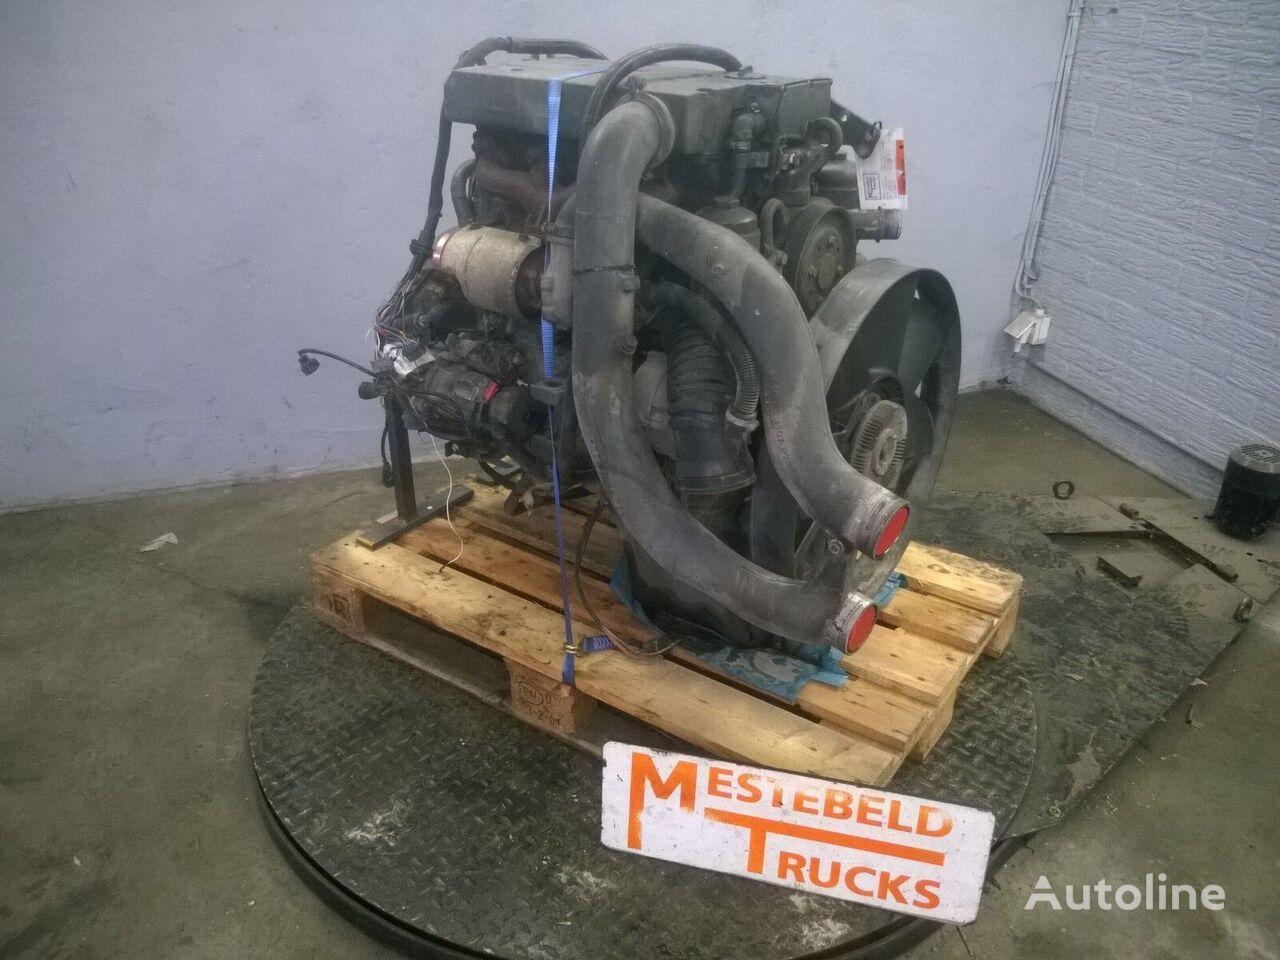 MERCEDES-BENZ Motor OM 904 LA II/4 kamyon için OM904 LA II motor